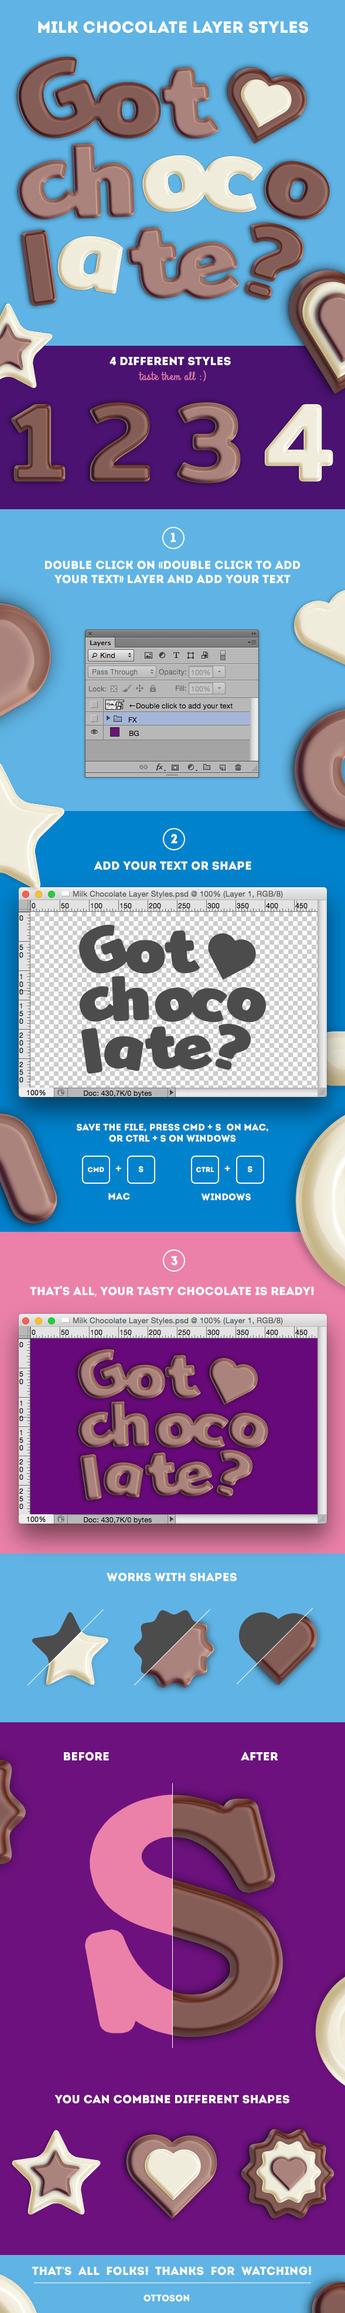 Milk Chocolate Layer Styles by ottoson